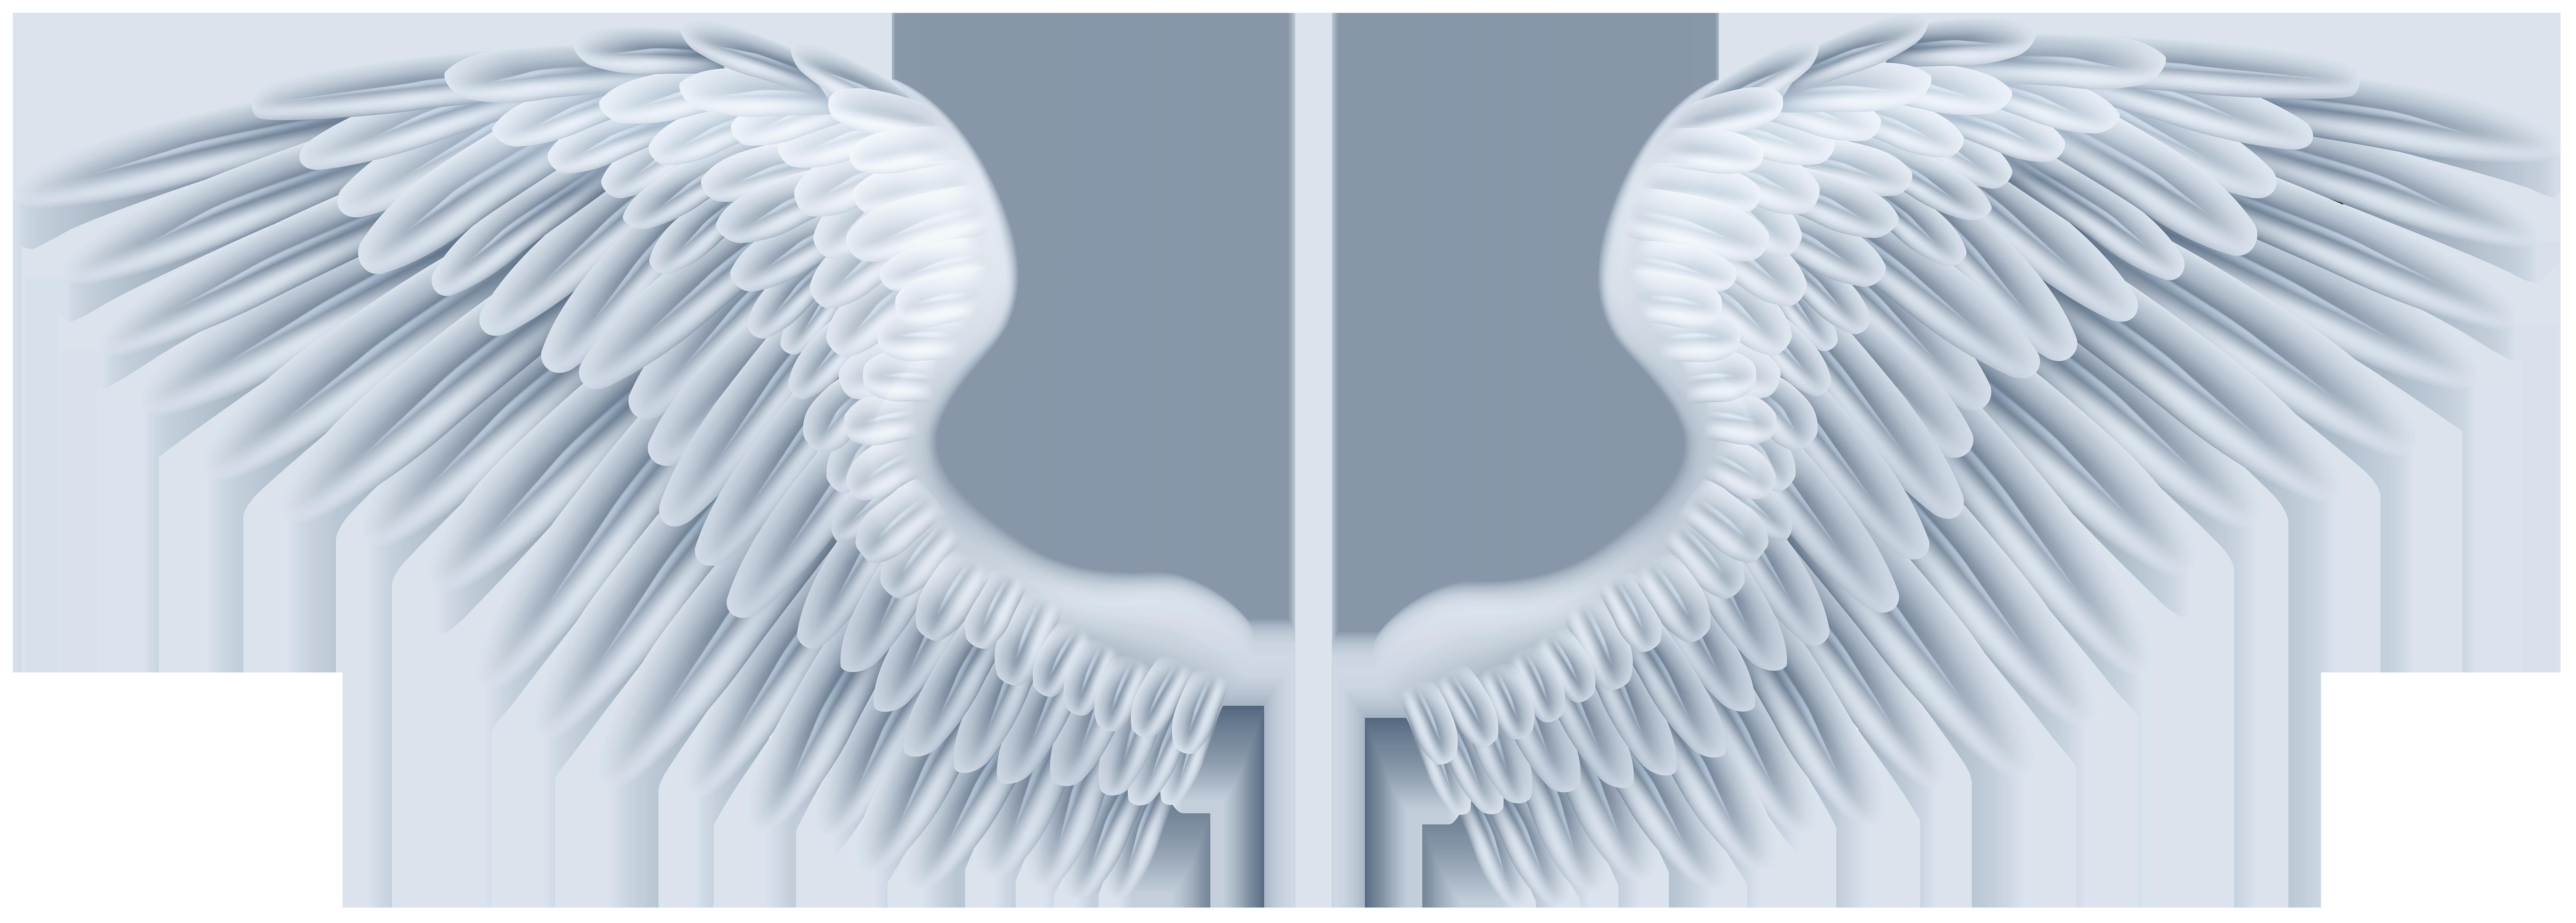 Дню свадьбы, картинки крыло ангела